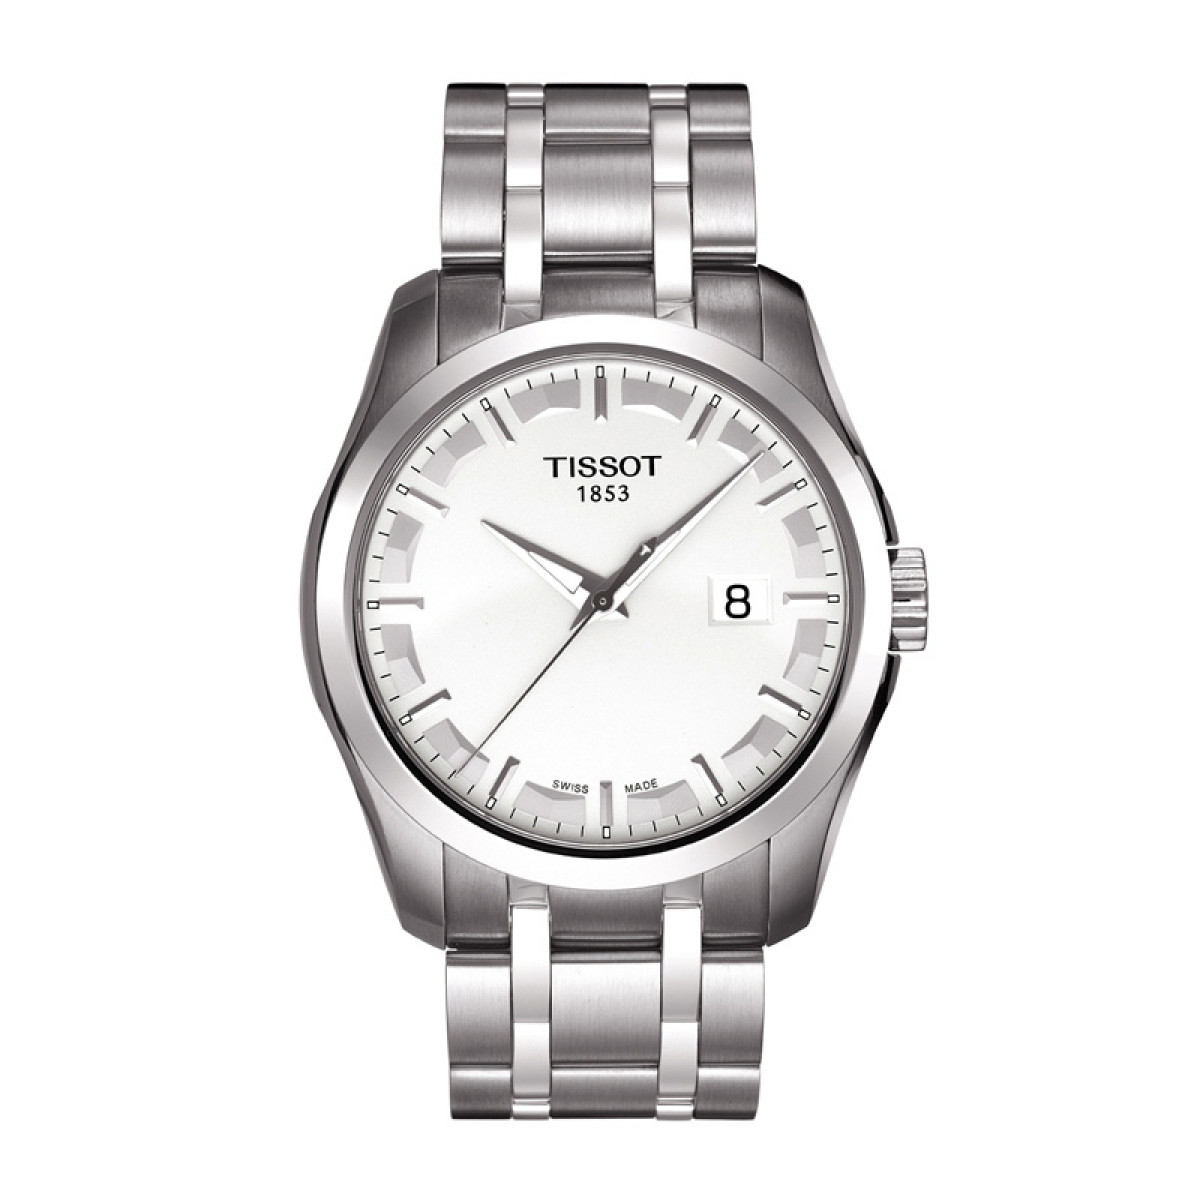 Часовник Tissot T035.410.11.031.00